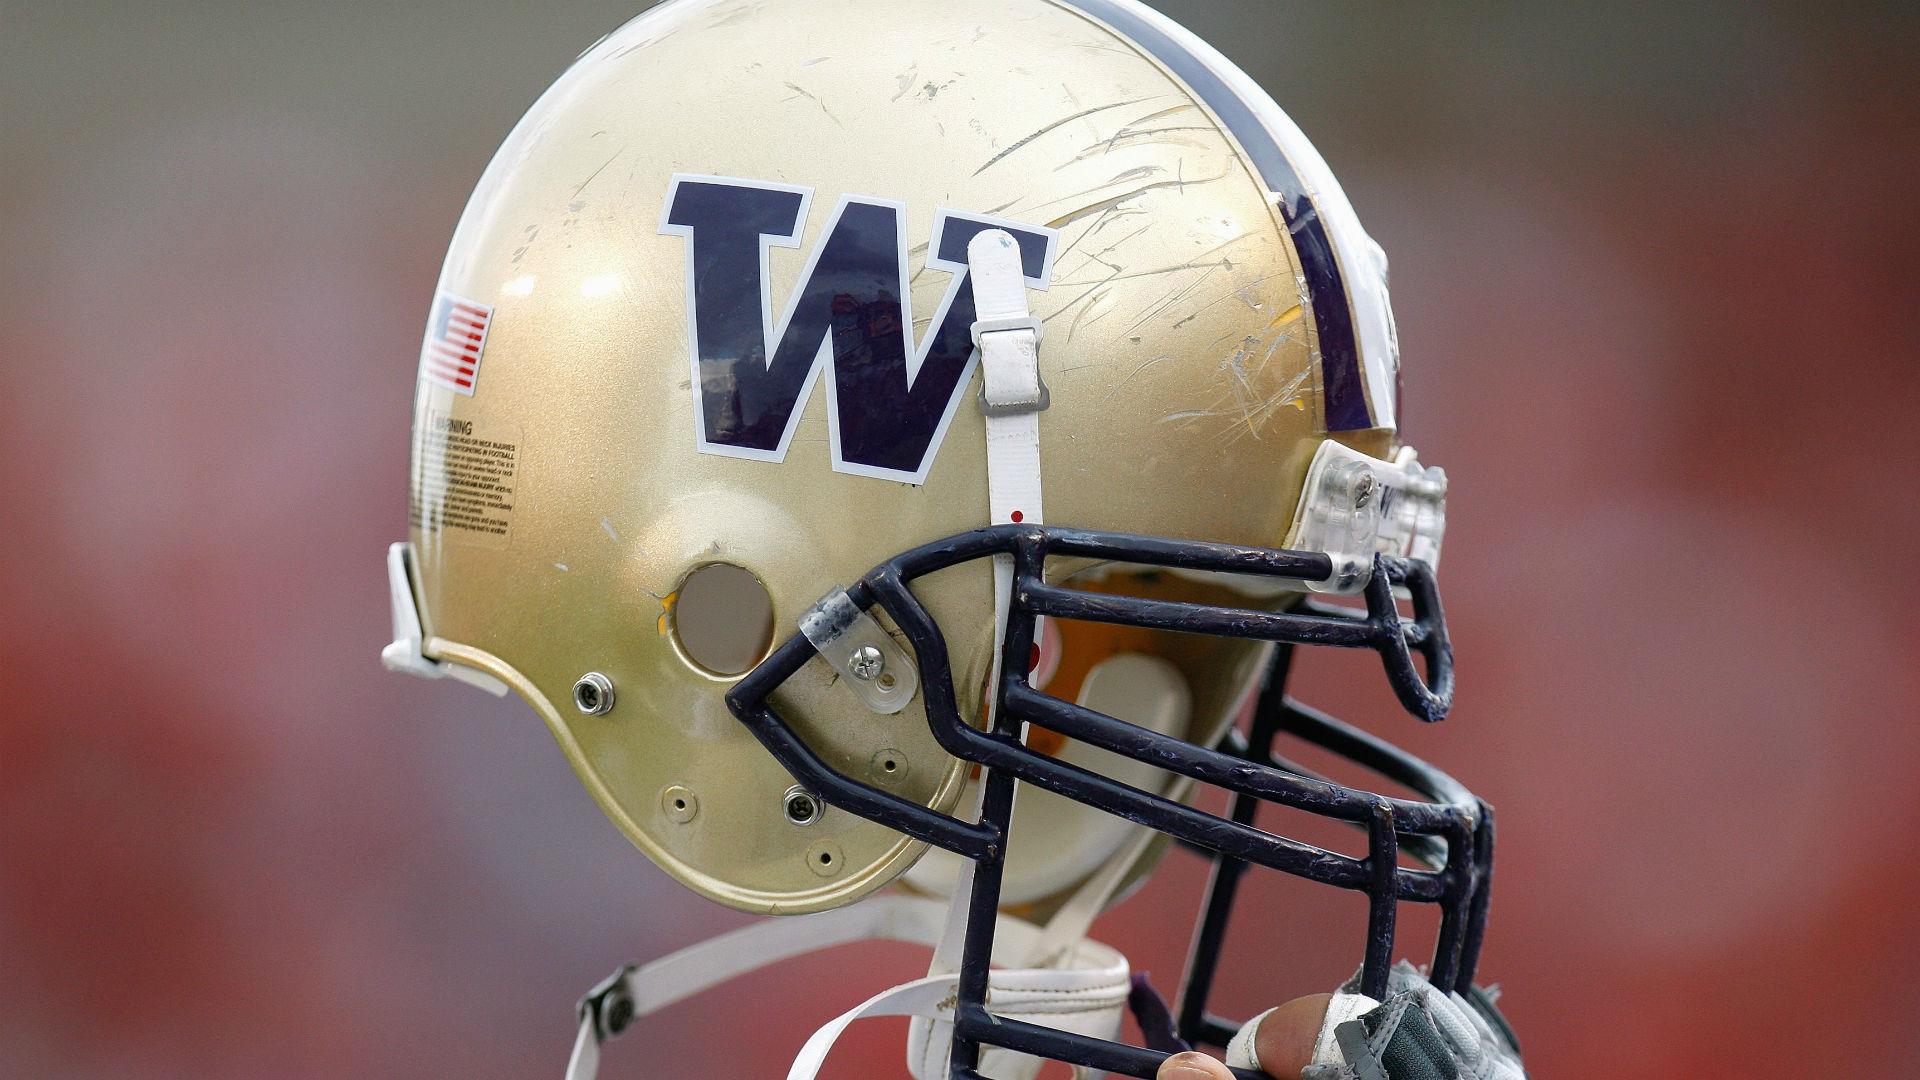 Washington-football-helmet_1owkpsm7csiru1bruxsc3rm1ju